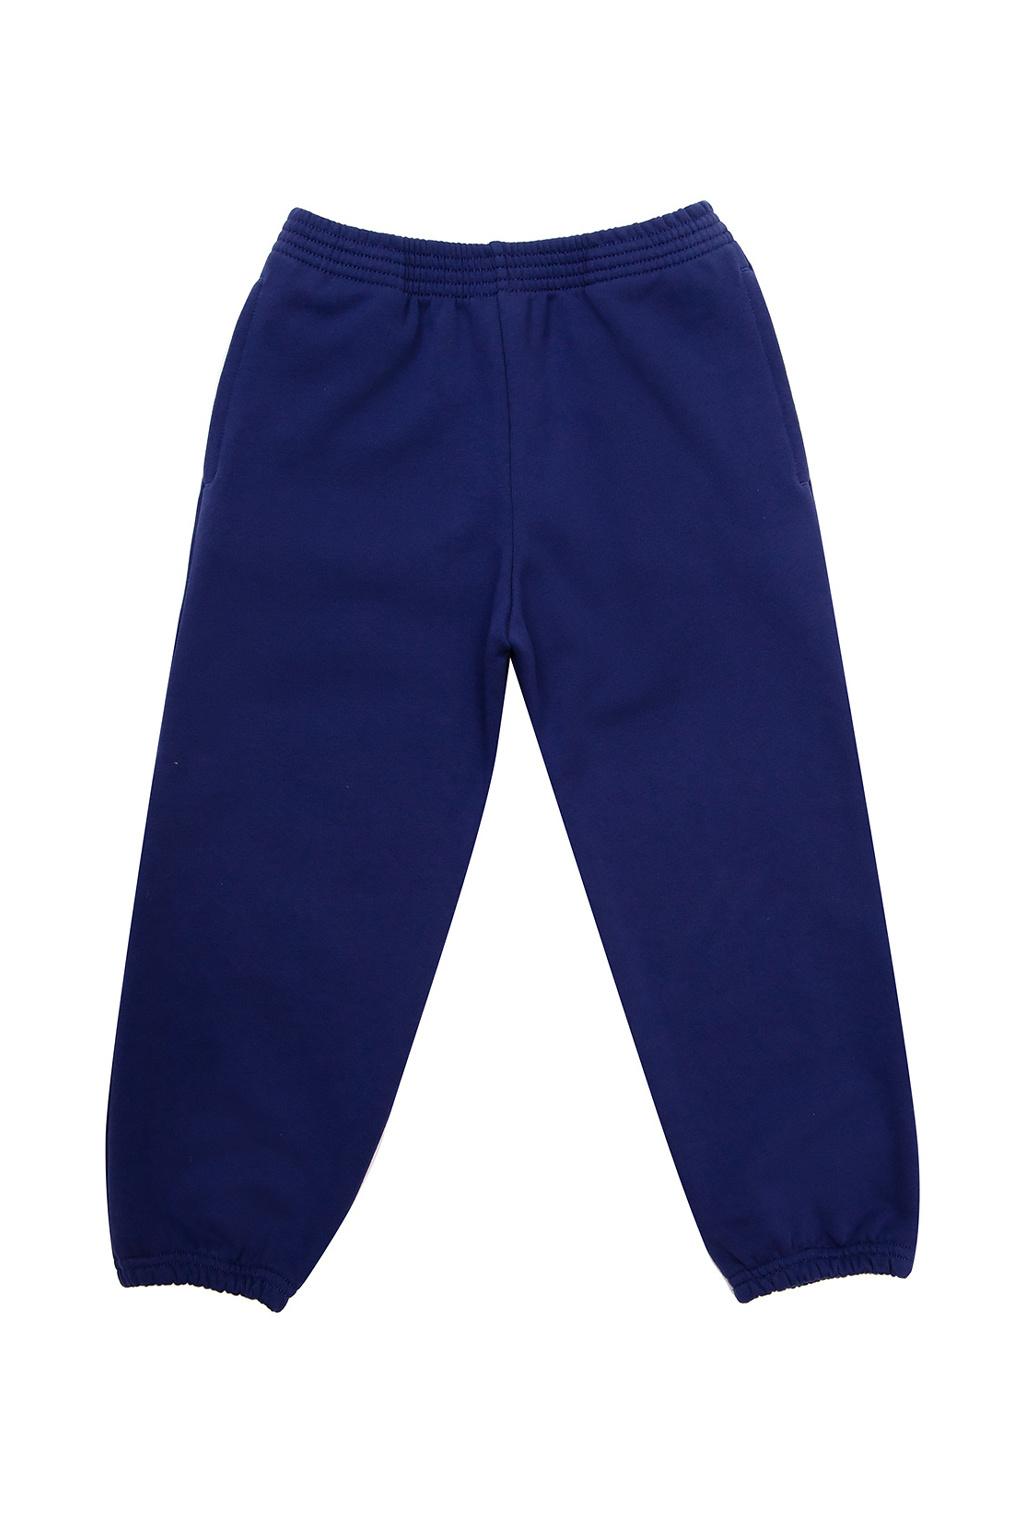 Balenciaga Kids Sweatpants with pockets